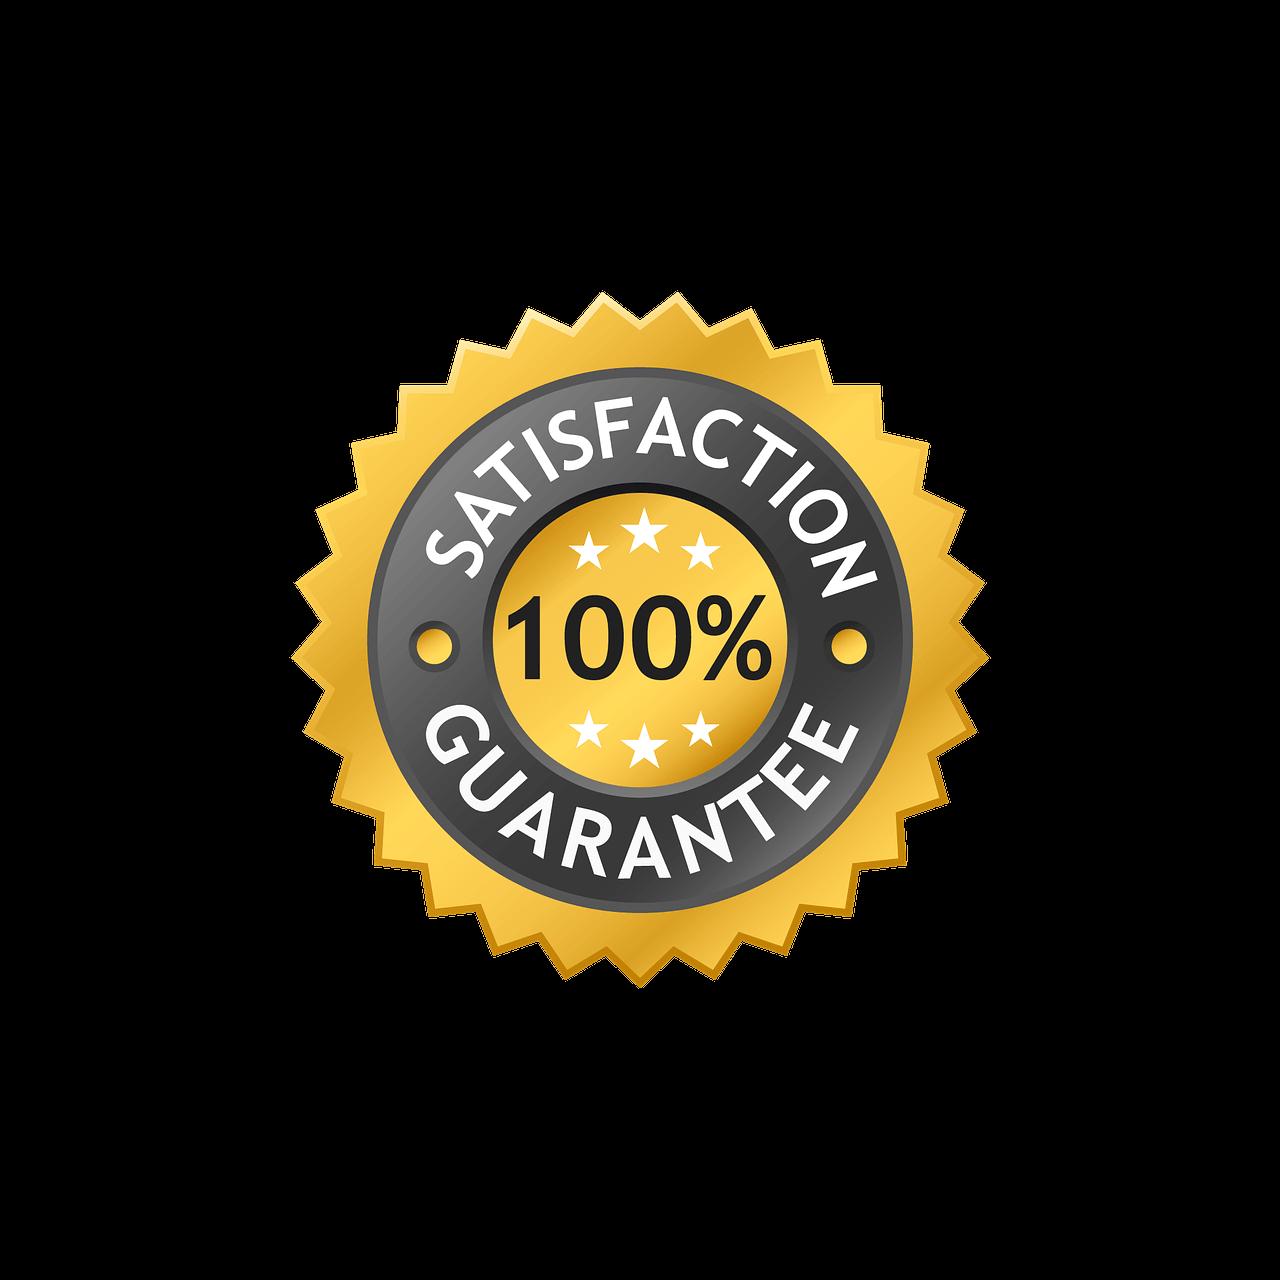 george banco guarantor loans 100 percent satisfaction guarantee symbol